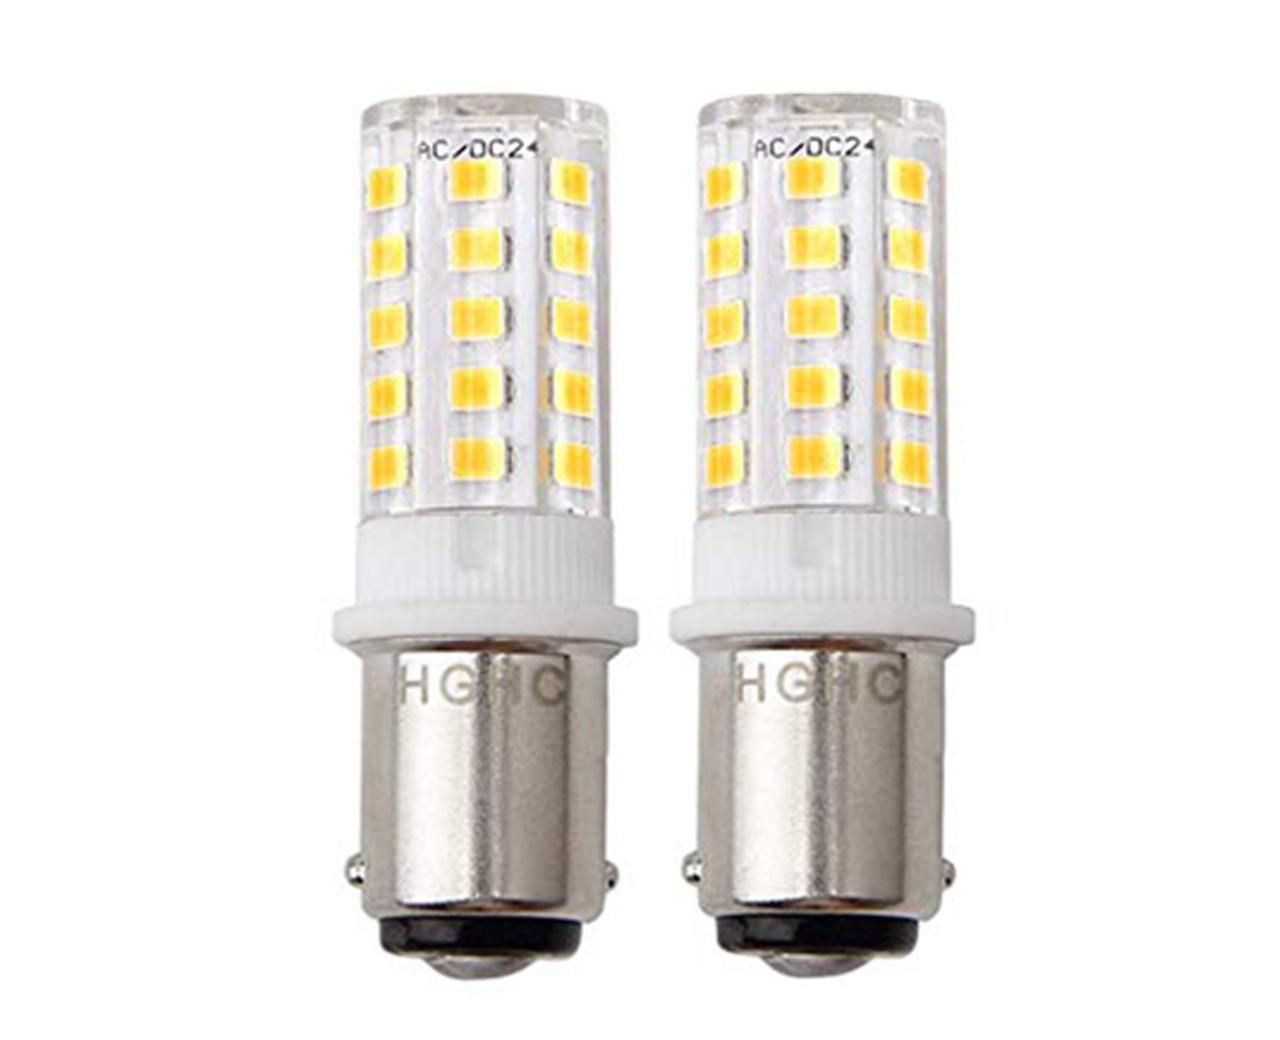 parallel-pin-bulb-19129.1556135161.jpg